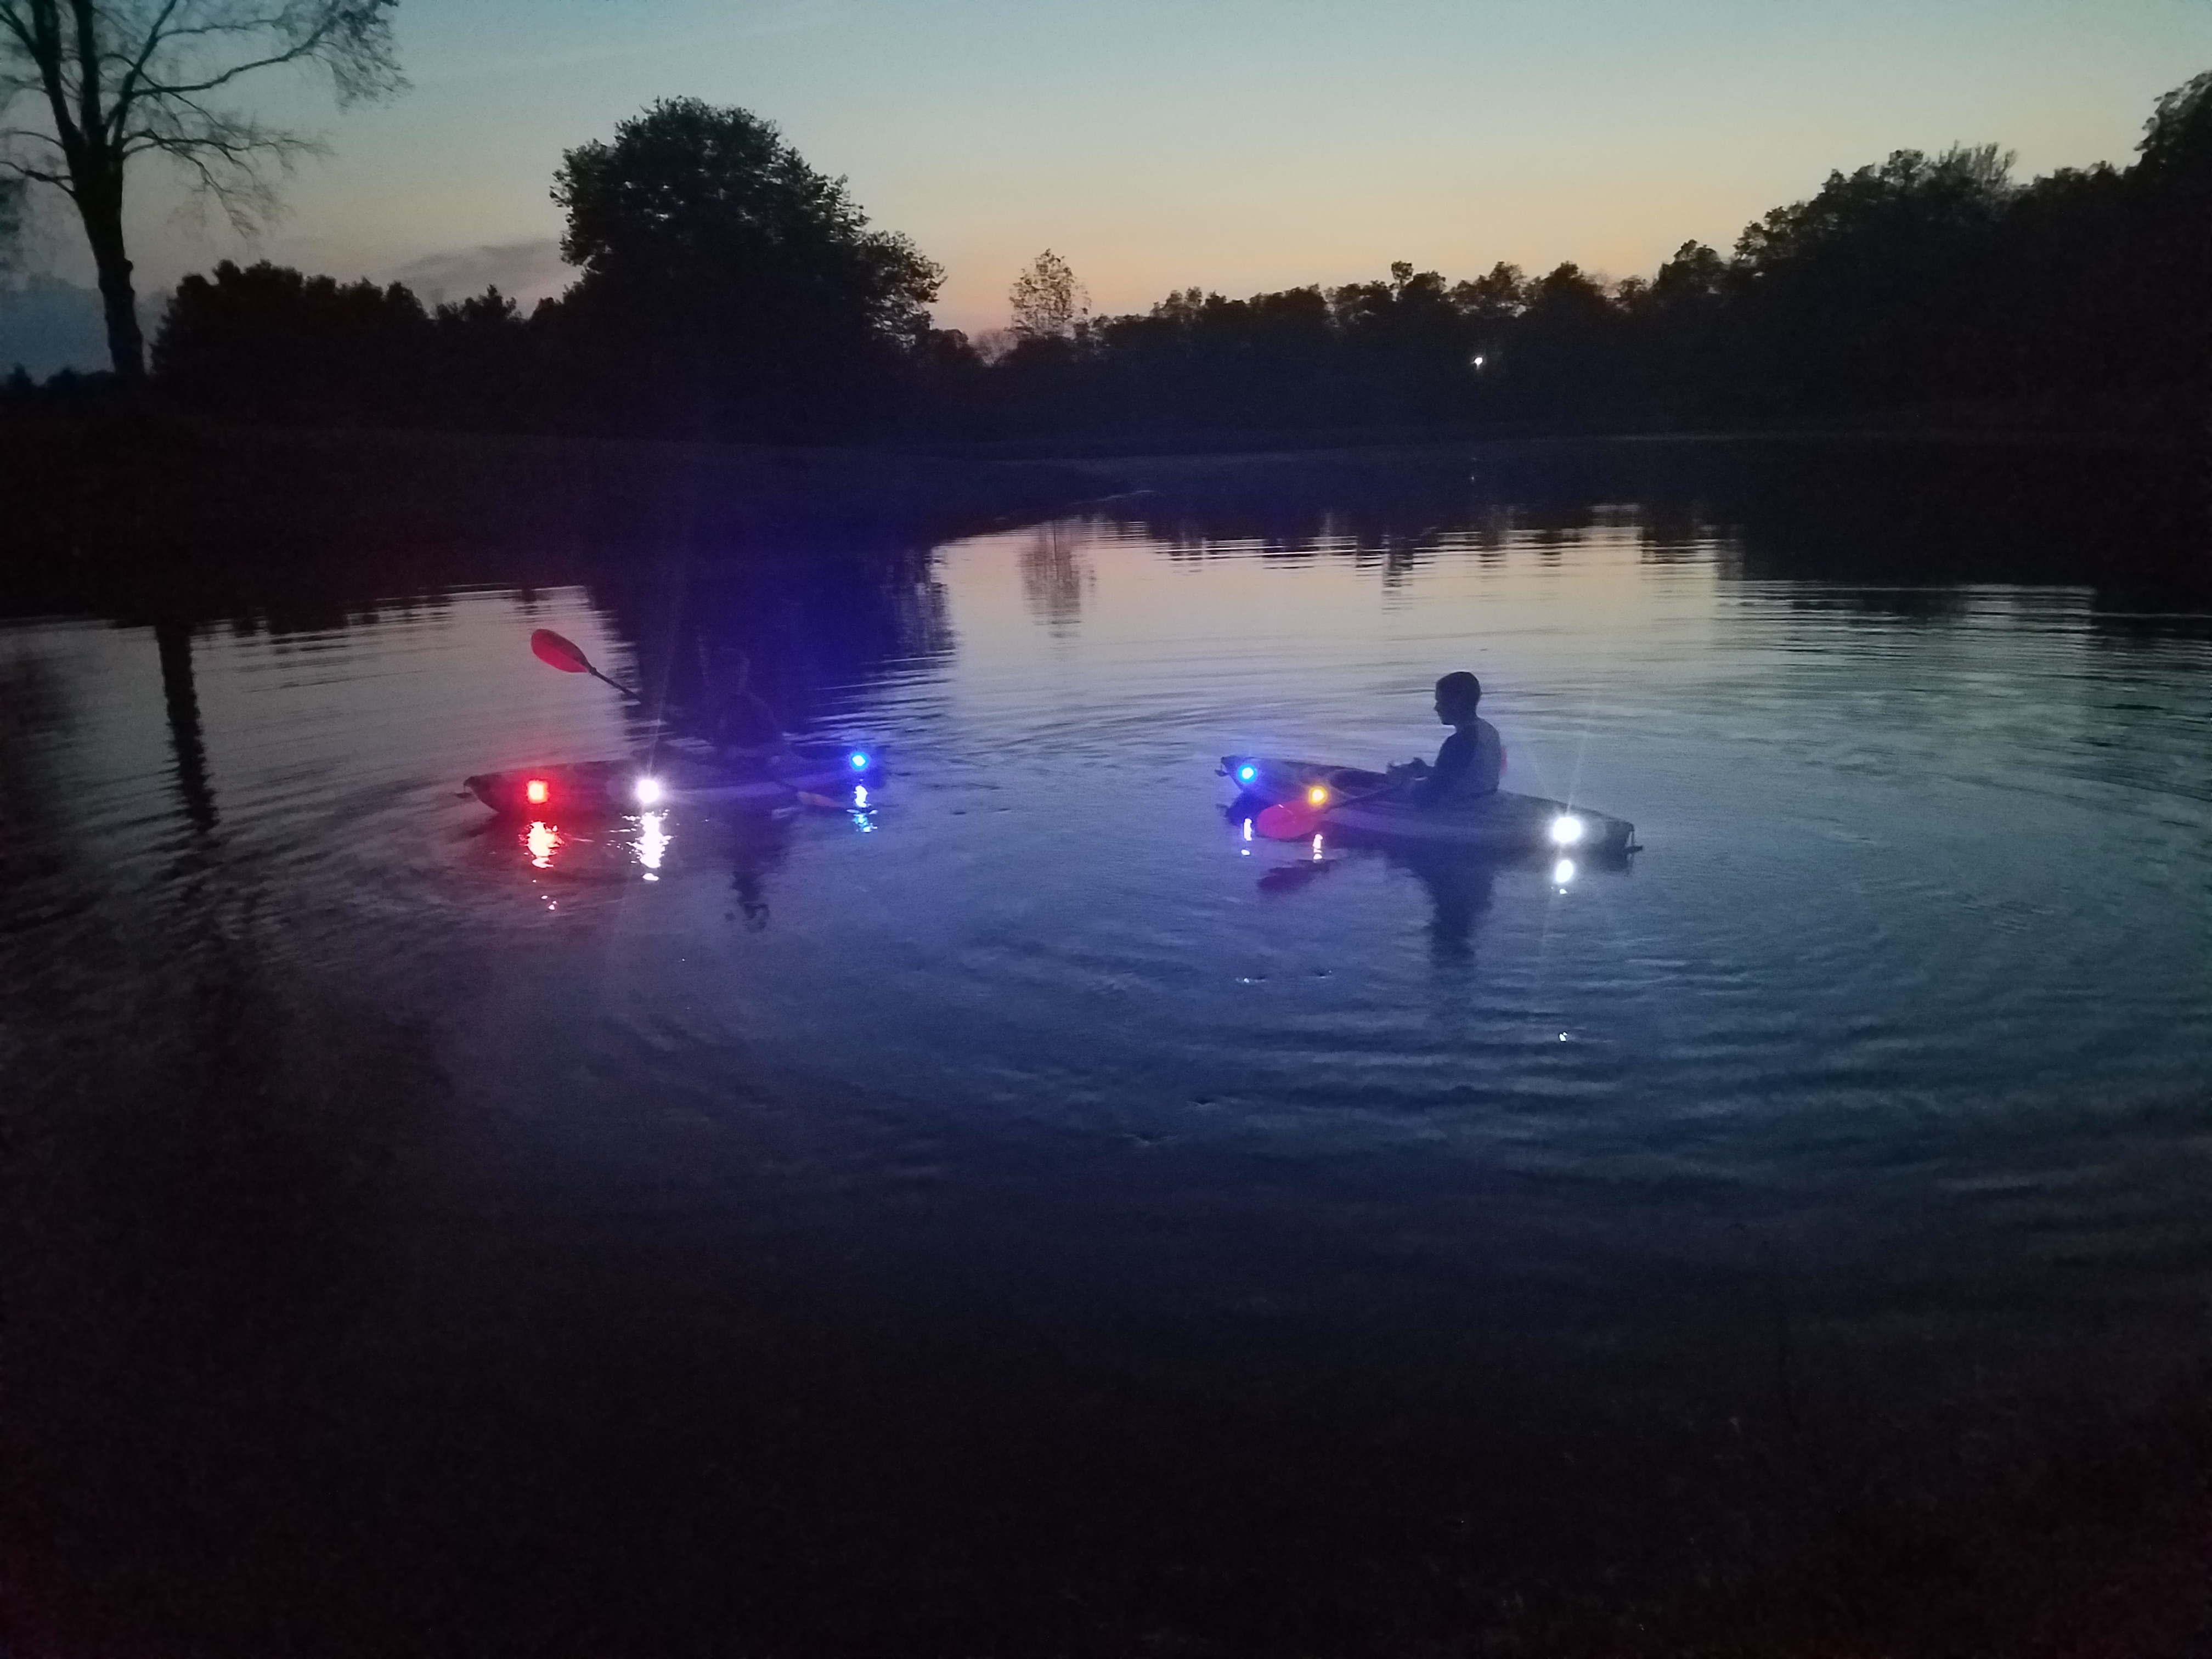 Kayak Lighting Systems